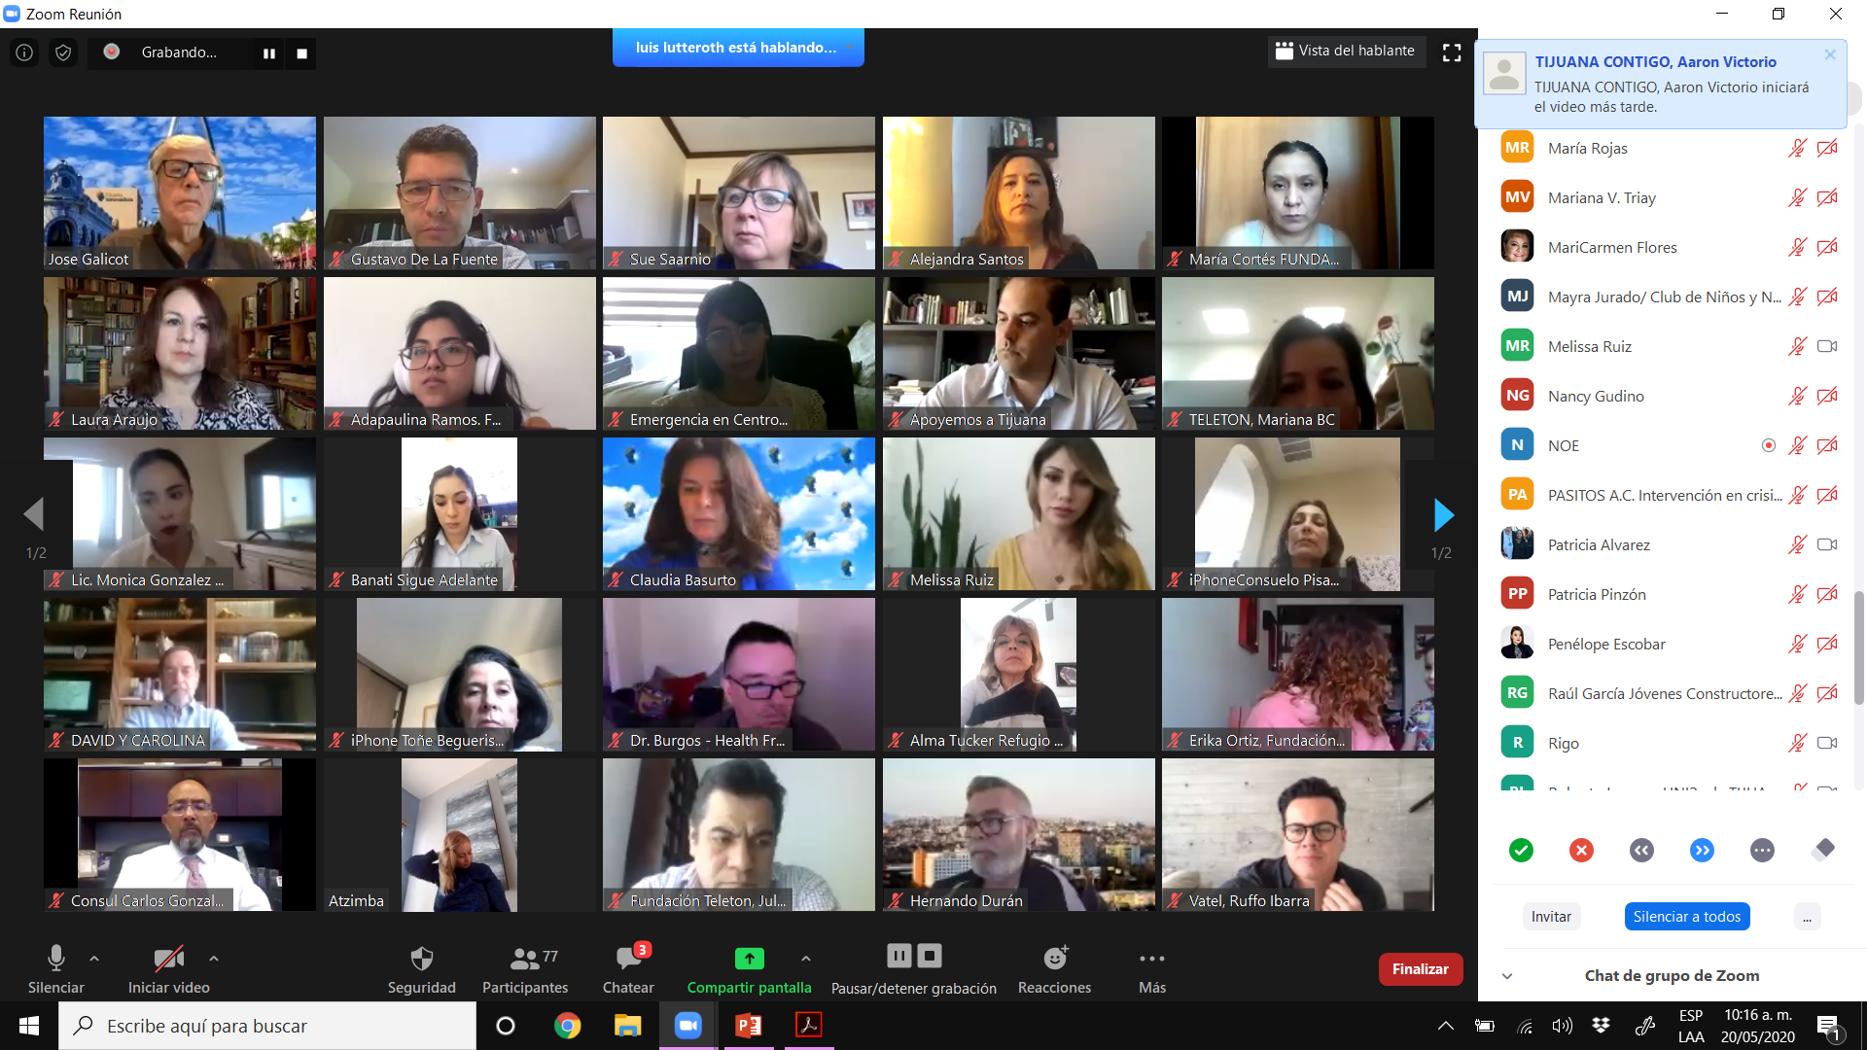 asociaciones civiles, tijuana innovadora, foro virtual Red X